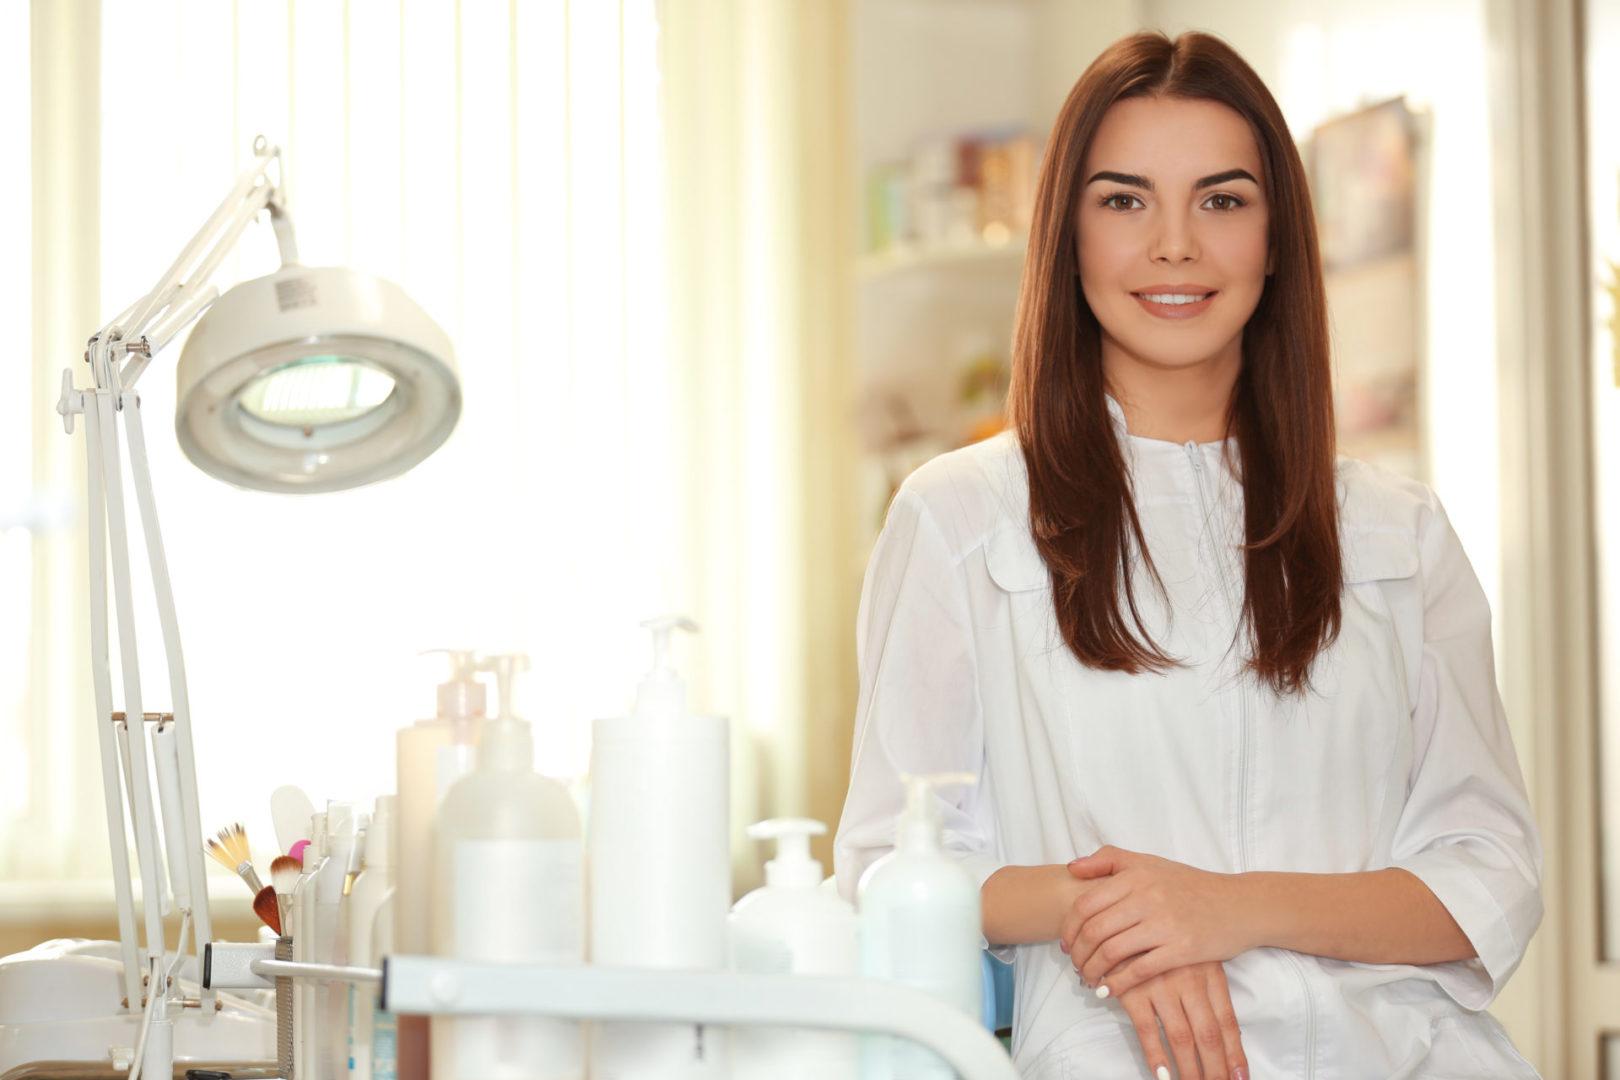 Happy Cosmetology school student